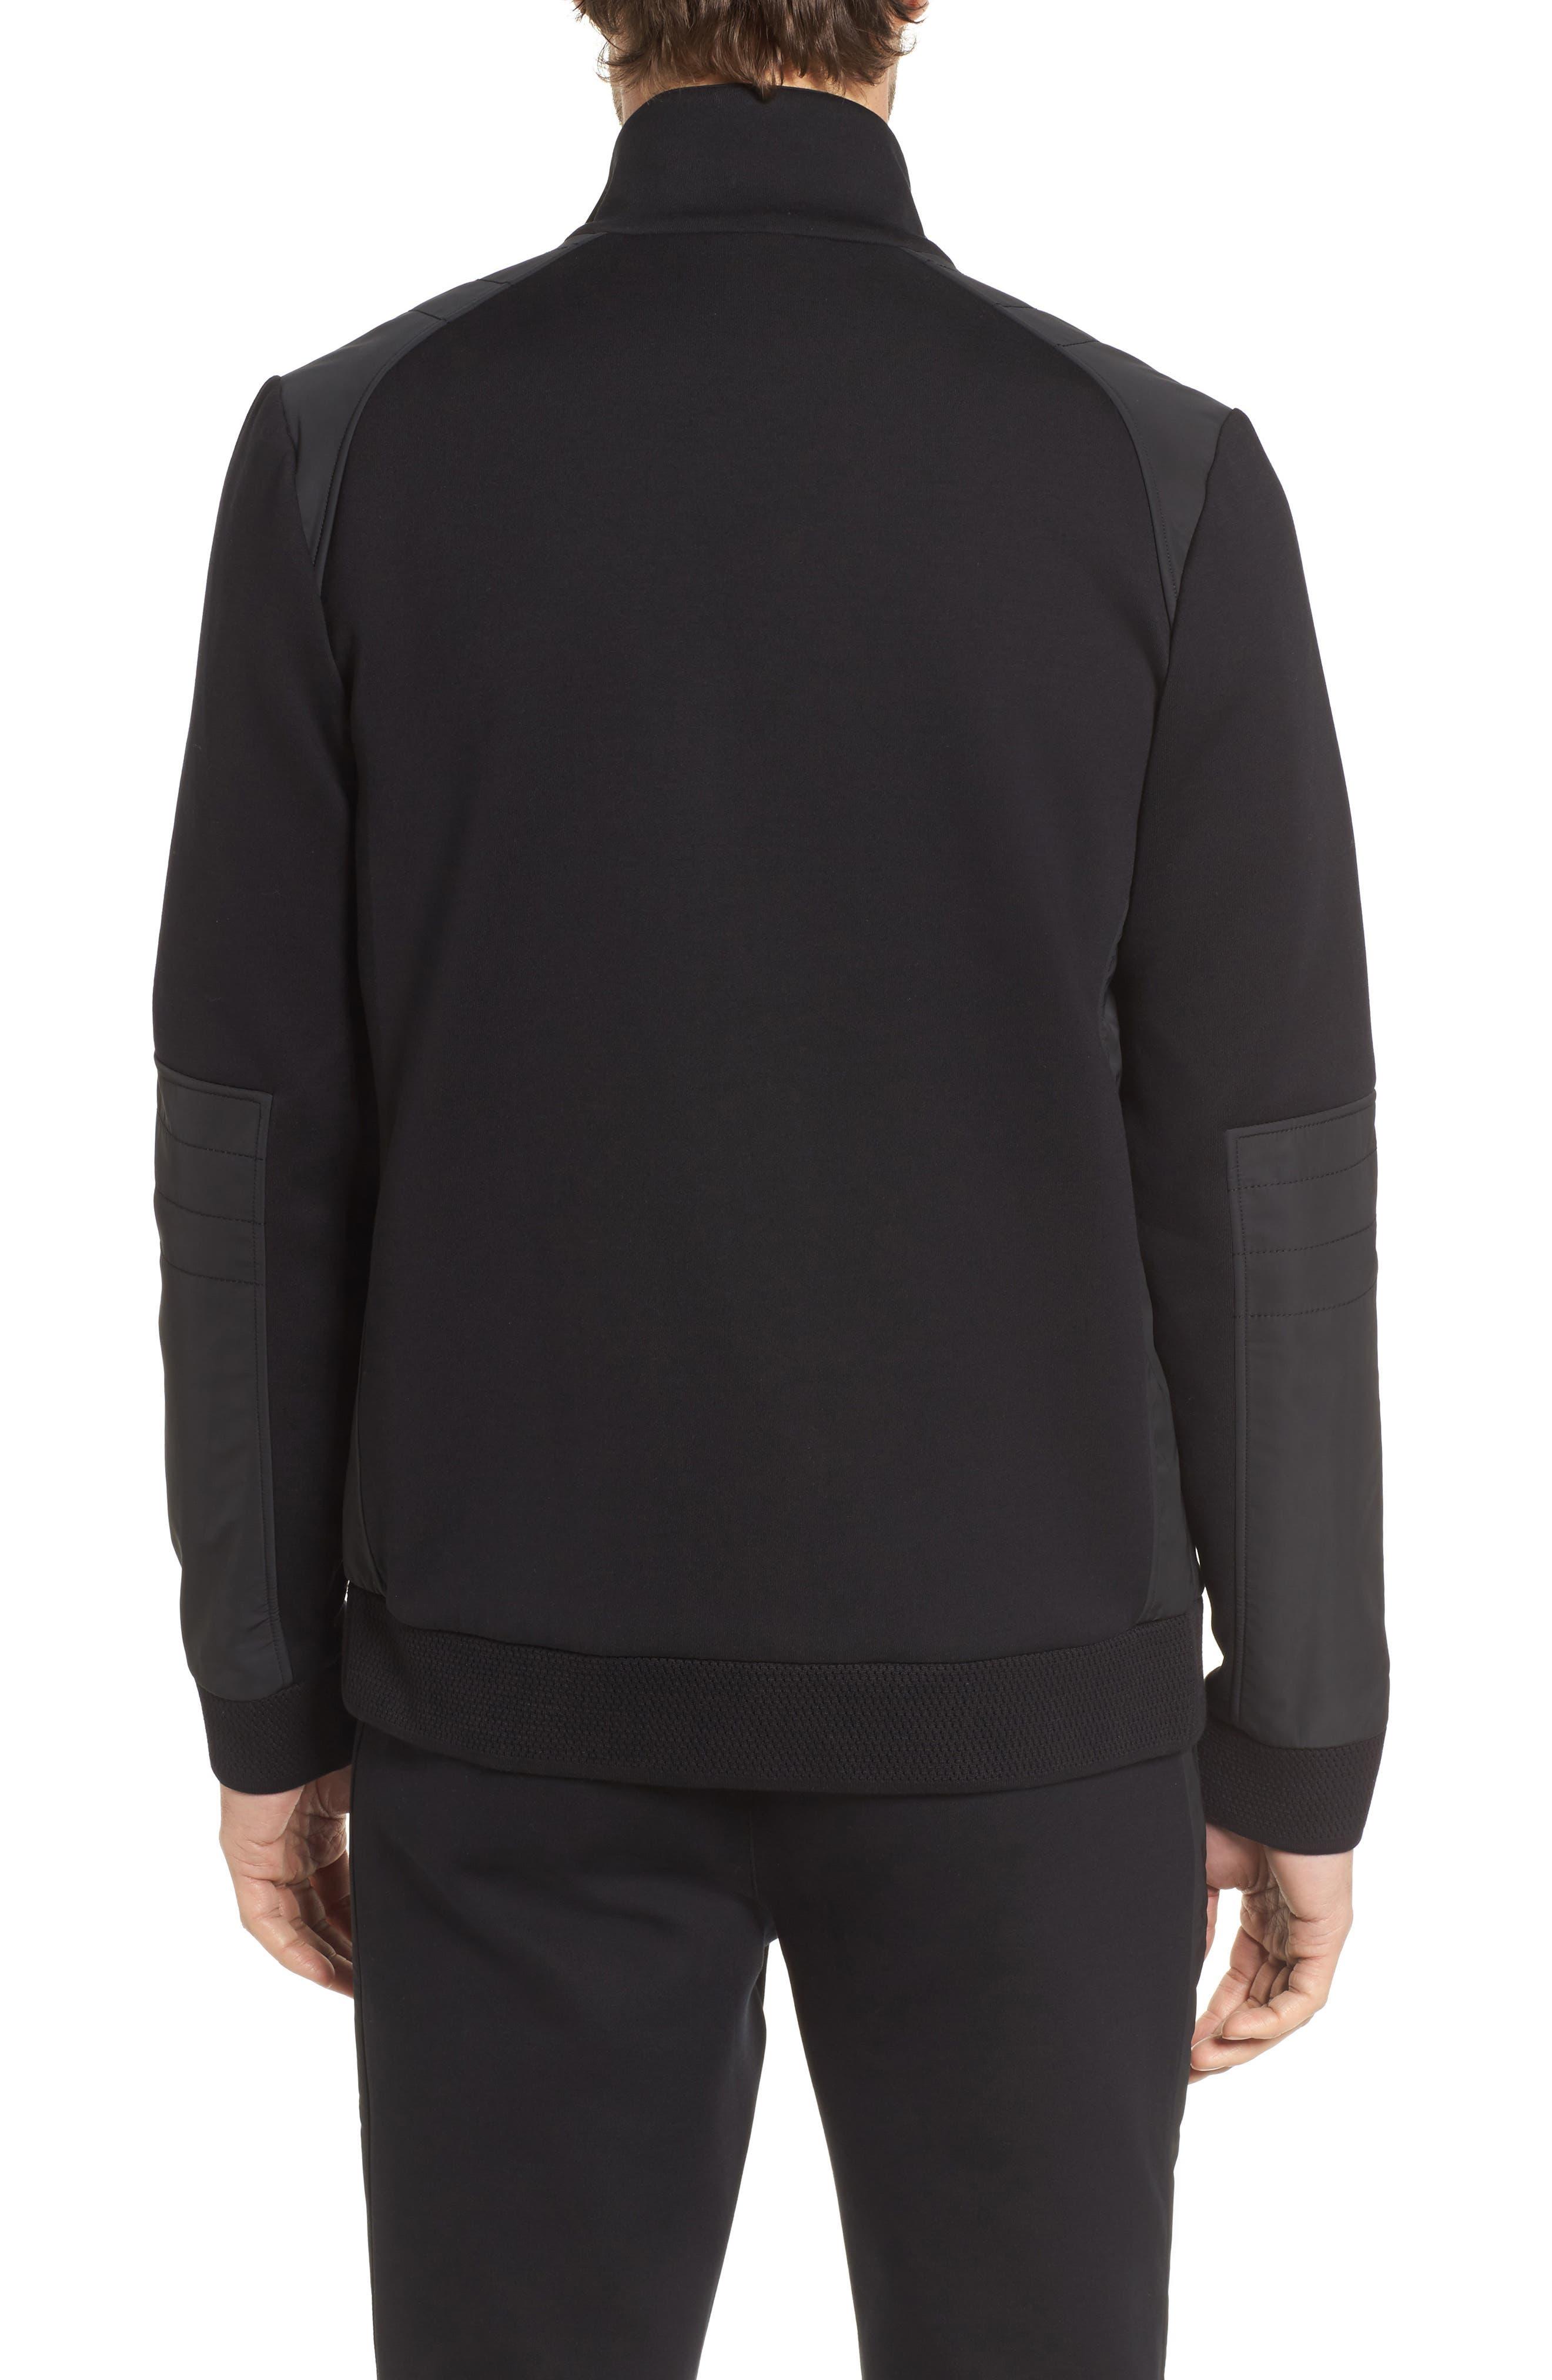 Soule Mercedes Slim Fit Zip Jacket,                             Alternate thumbnail 2, color,                             Black